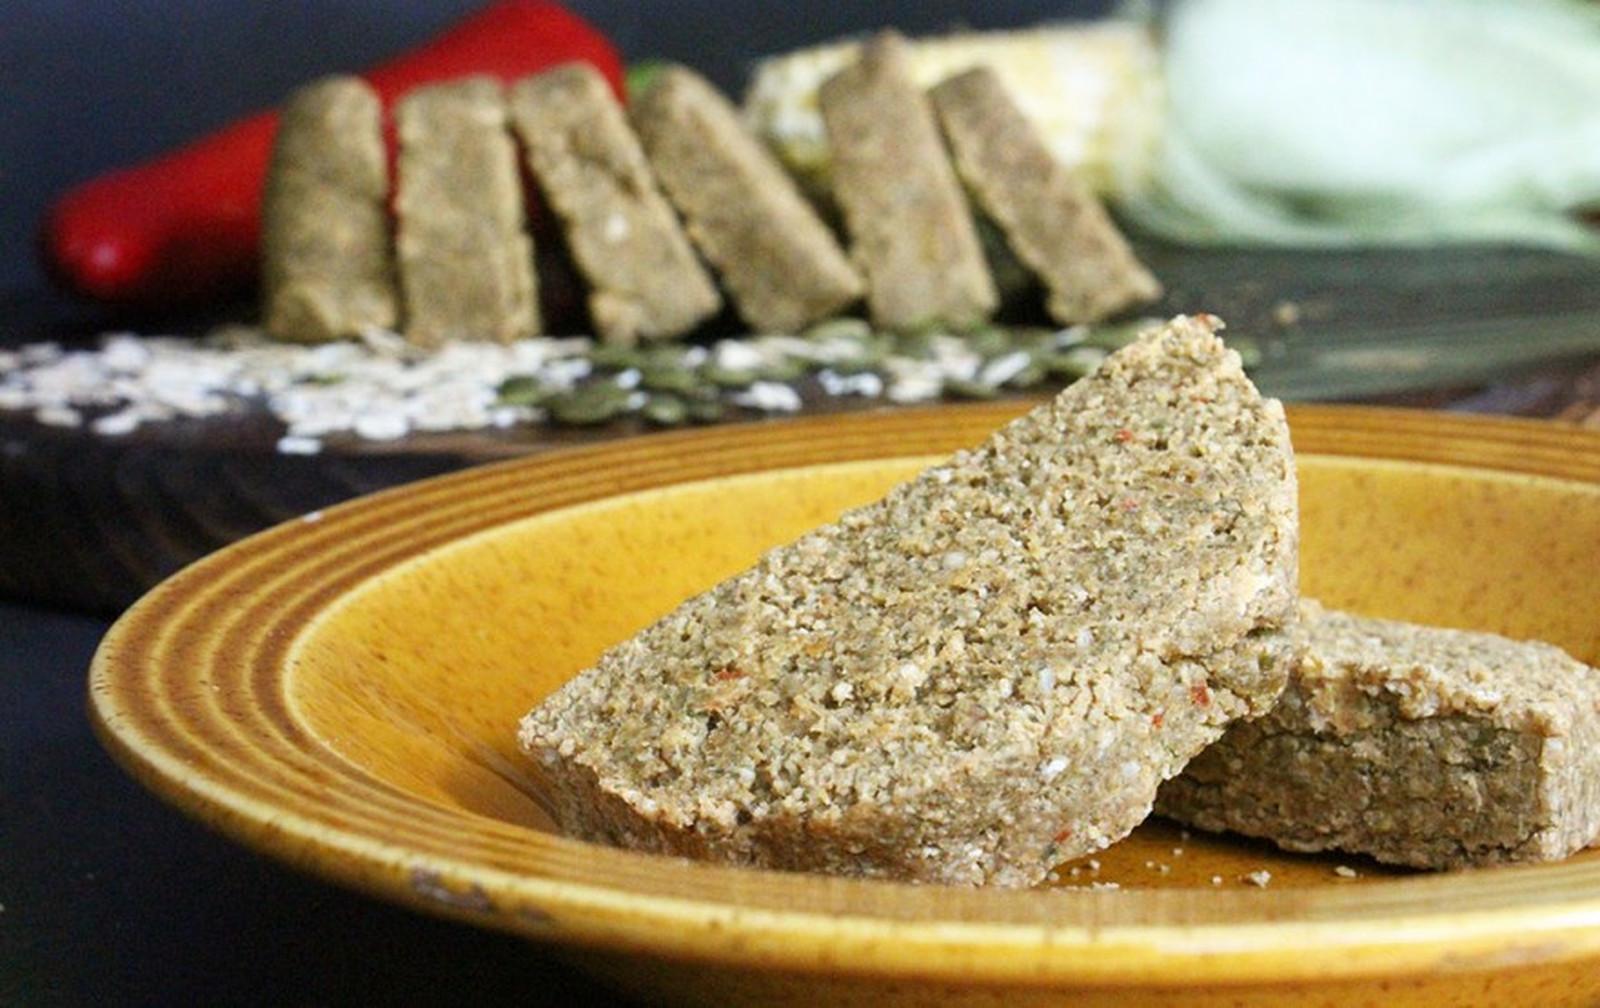 Raw Vegan Cornbread [Gluten-Free, Nut-Free]